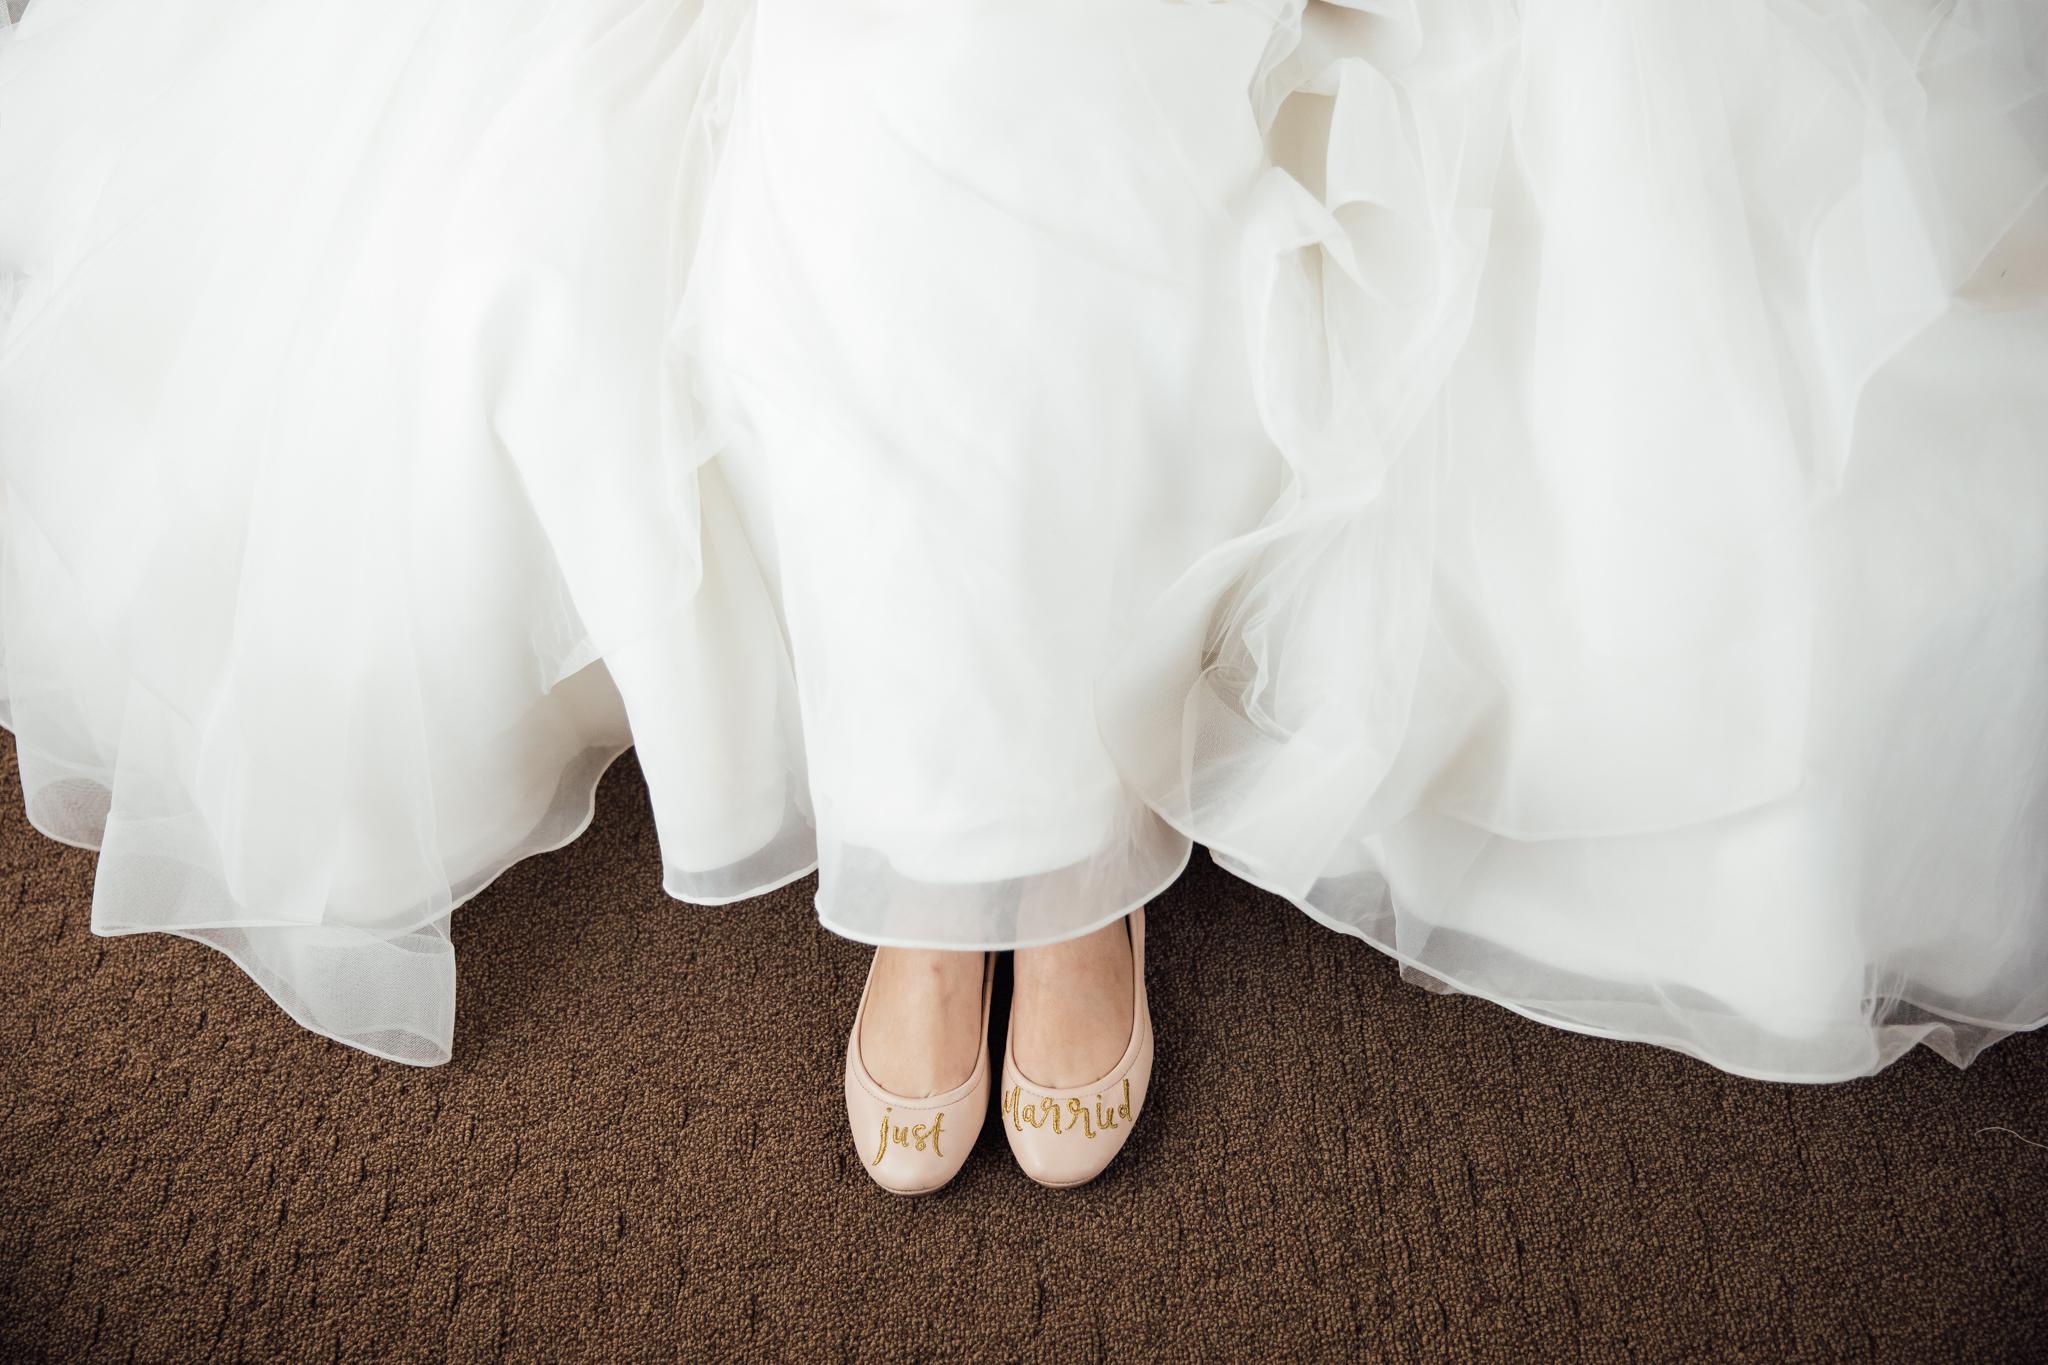 memphis-wedding-photographers-thewarmtharoundyou-ballinese-ballroom (54 of 232).jpg